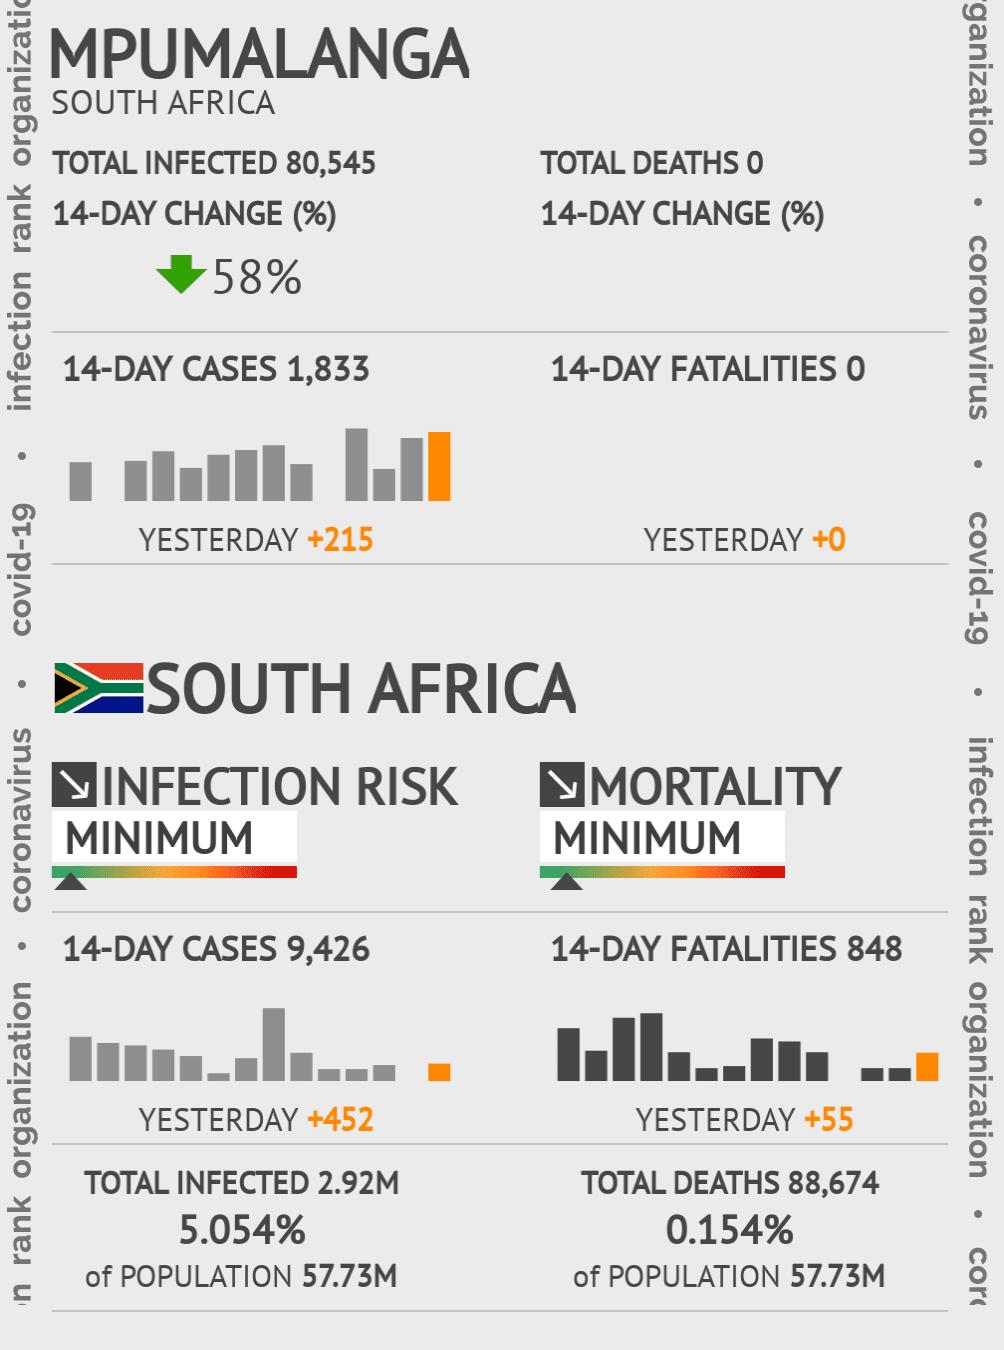 Mpumalanga Coronavirus Covid-19 Risk of Infection on March 03, 2021